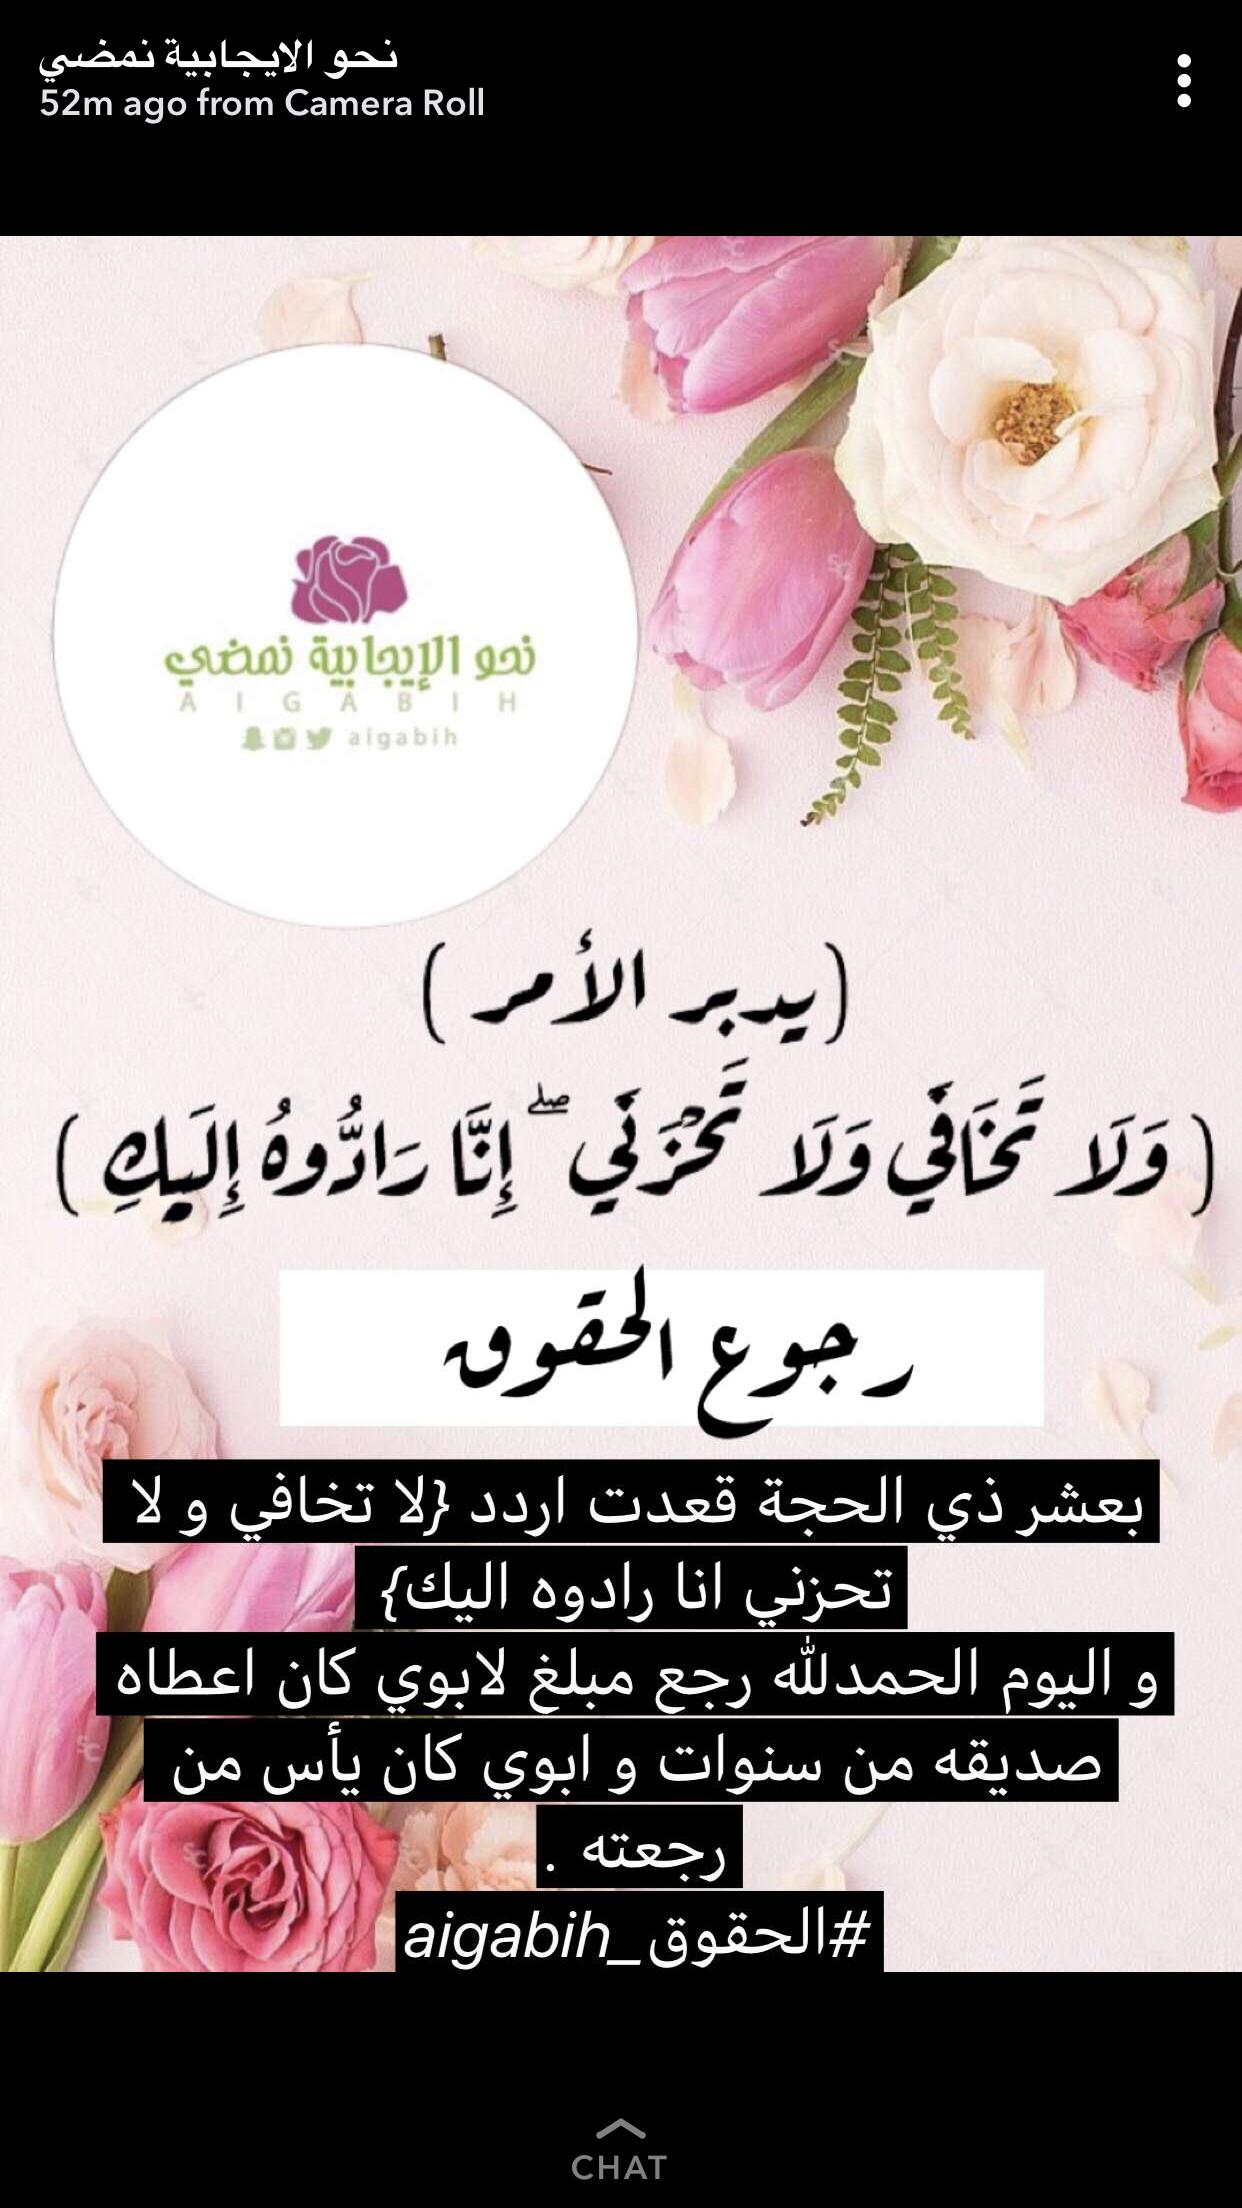 Pin By Fadak On جذب Islam Facts Islamic Phrases Islamic Teachings